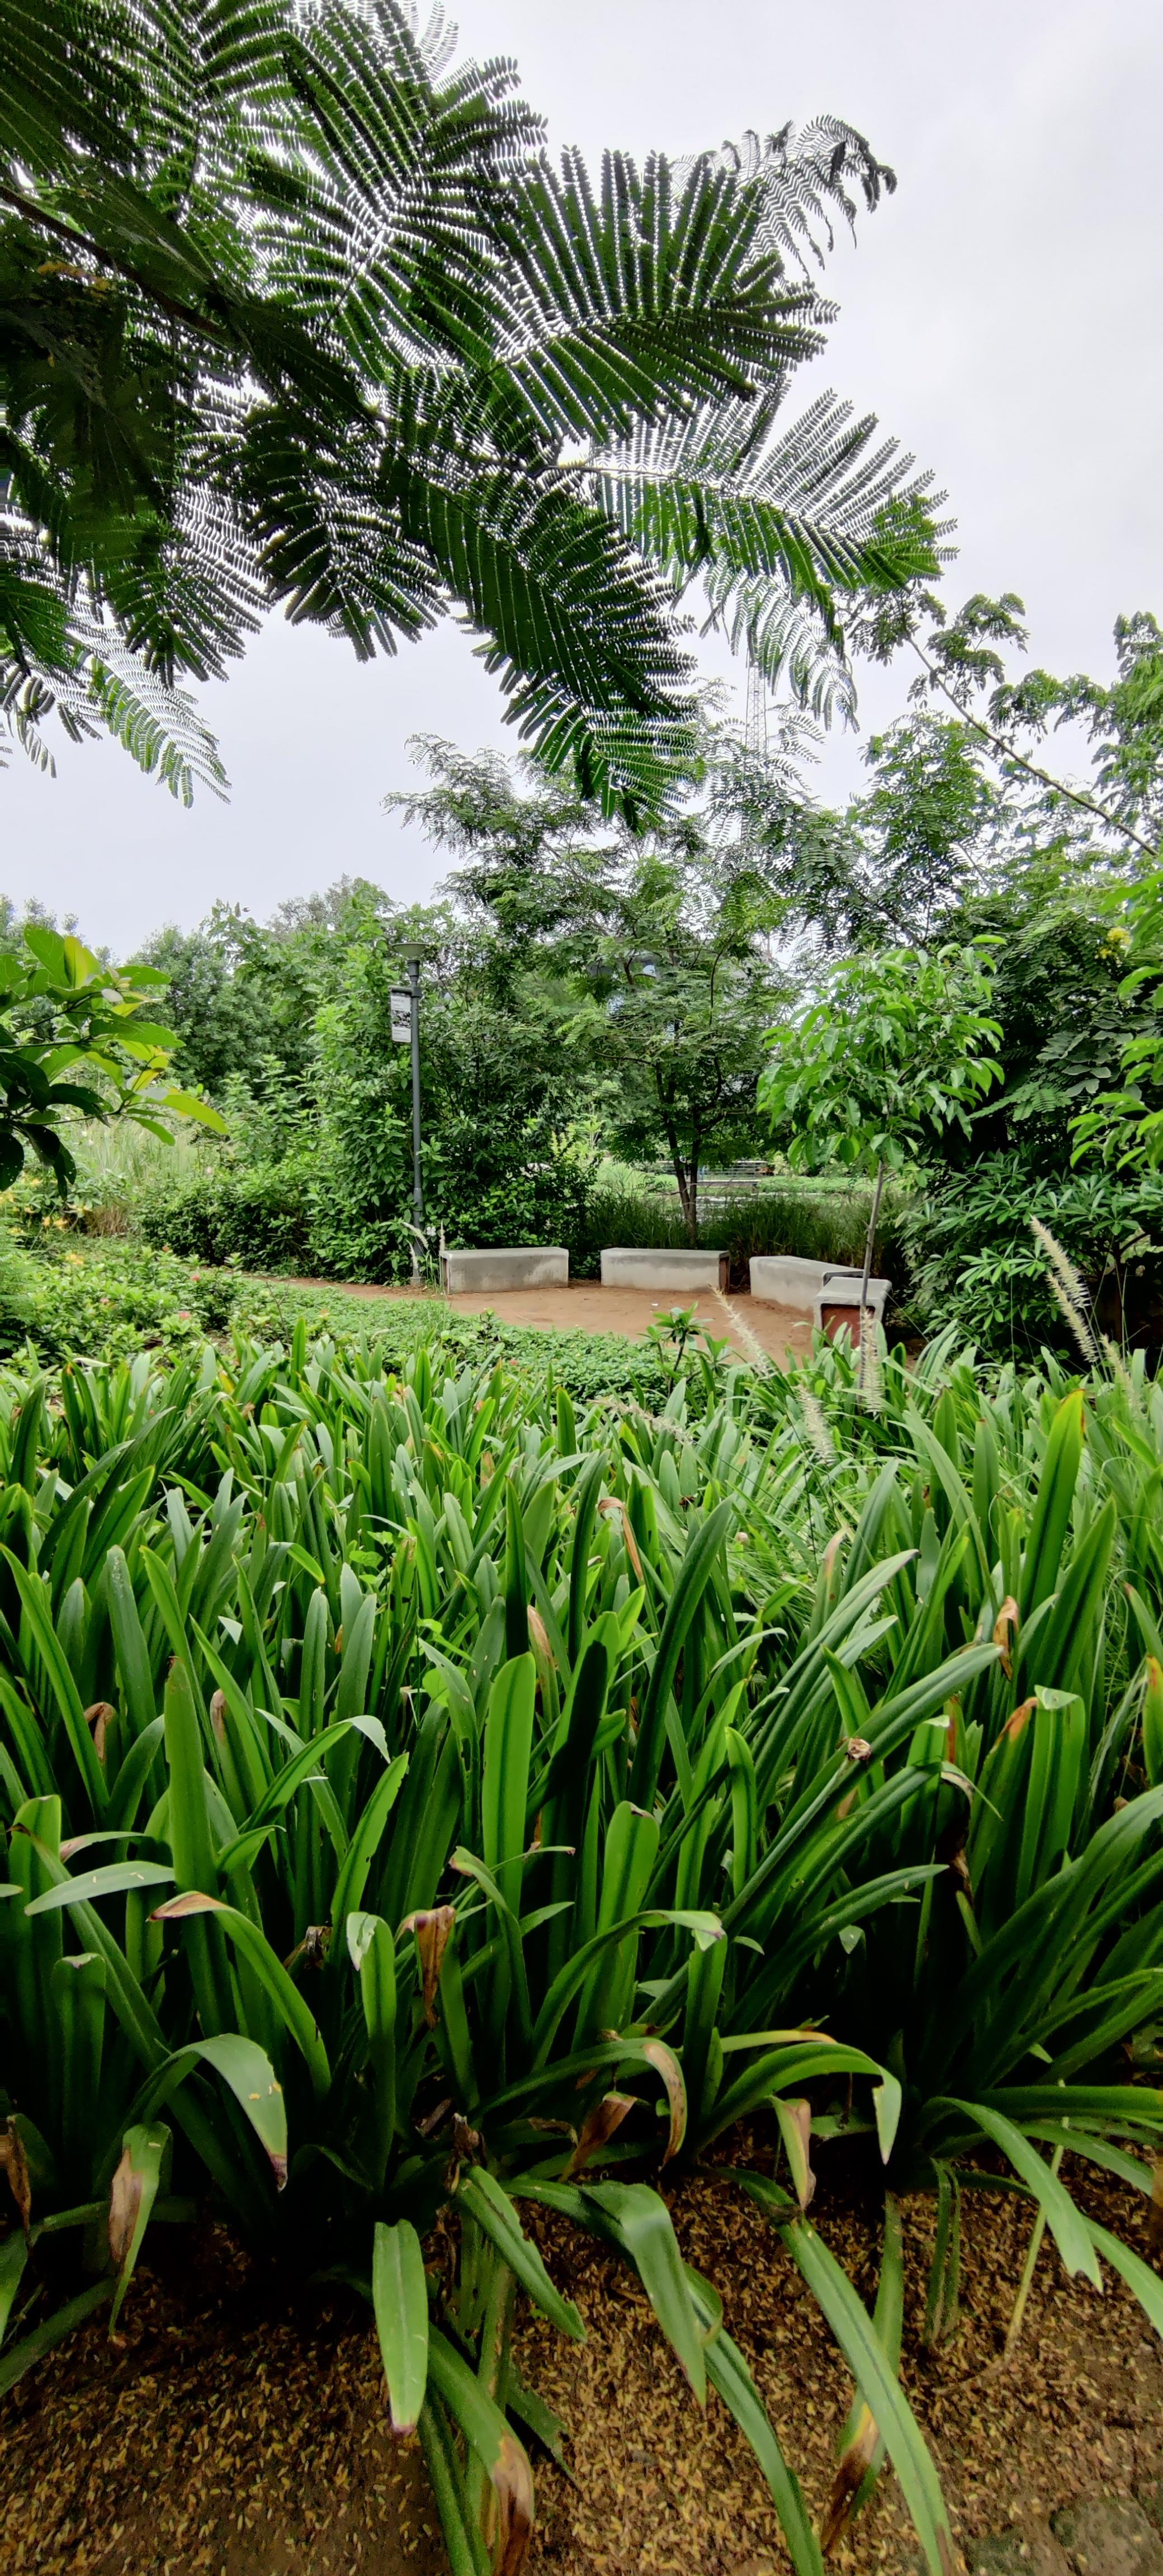 Symphone Forest Landscaping